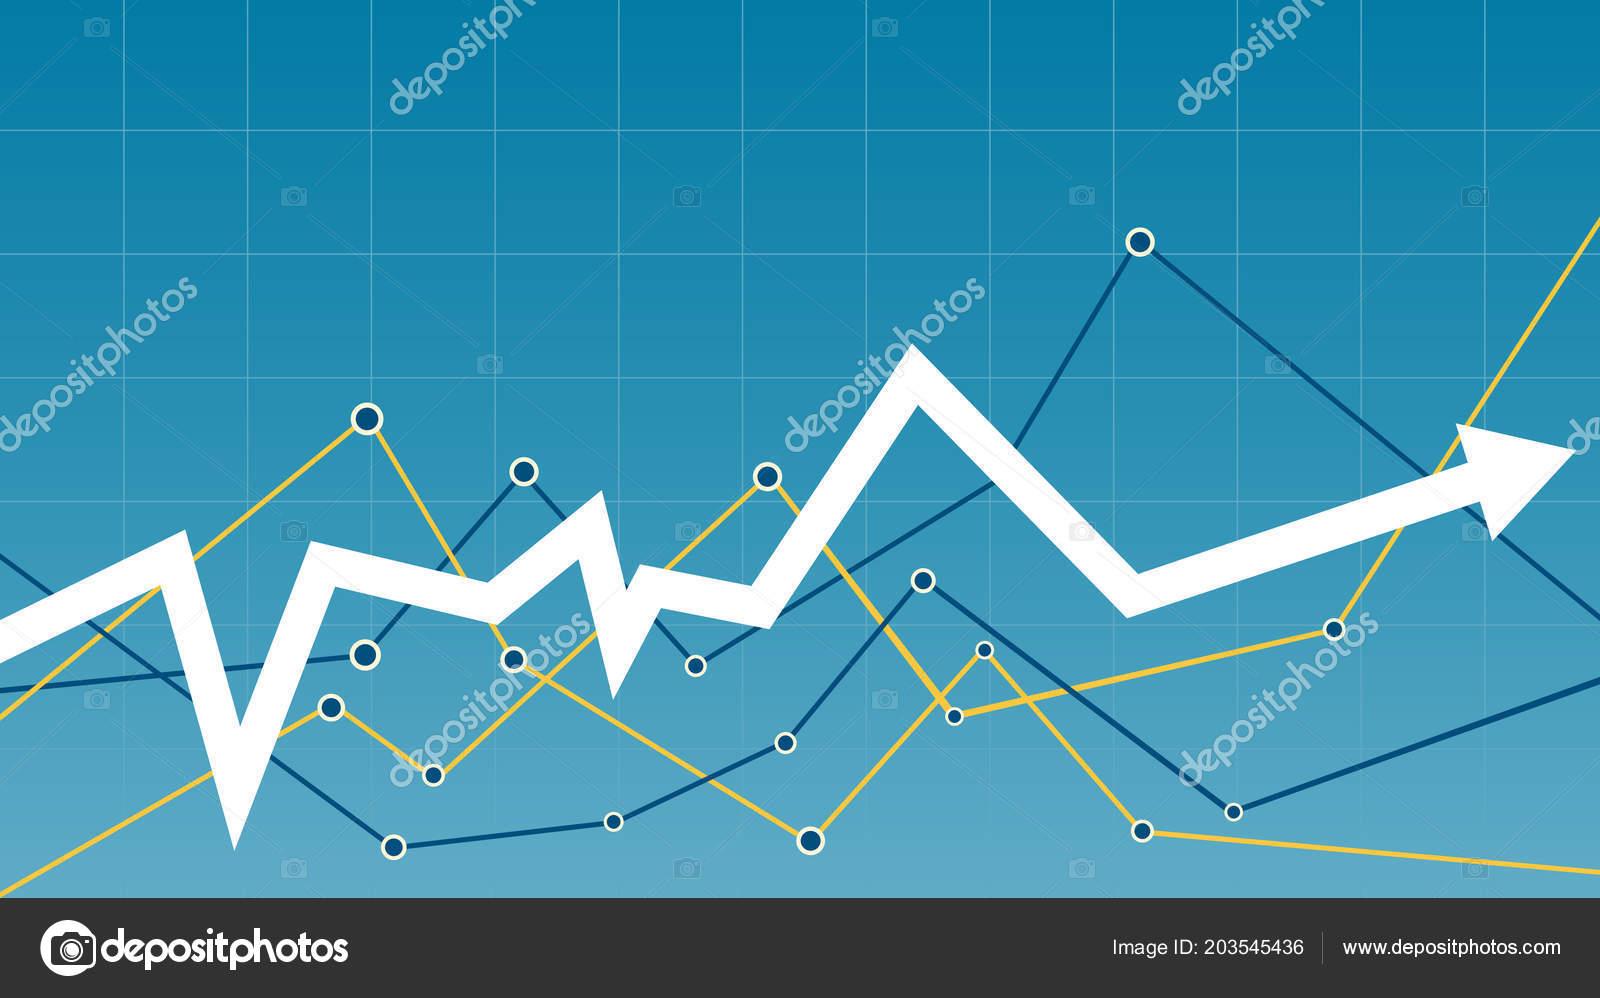 r u00e9sum u00e9 financier graphique avec fl u00e8che  u2014 image vectorielle eightshot  u00a9  203545436